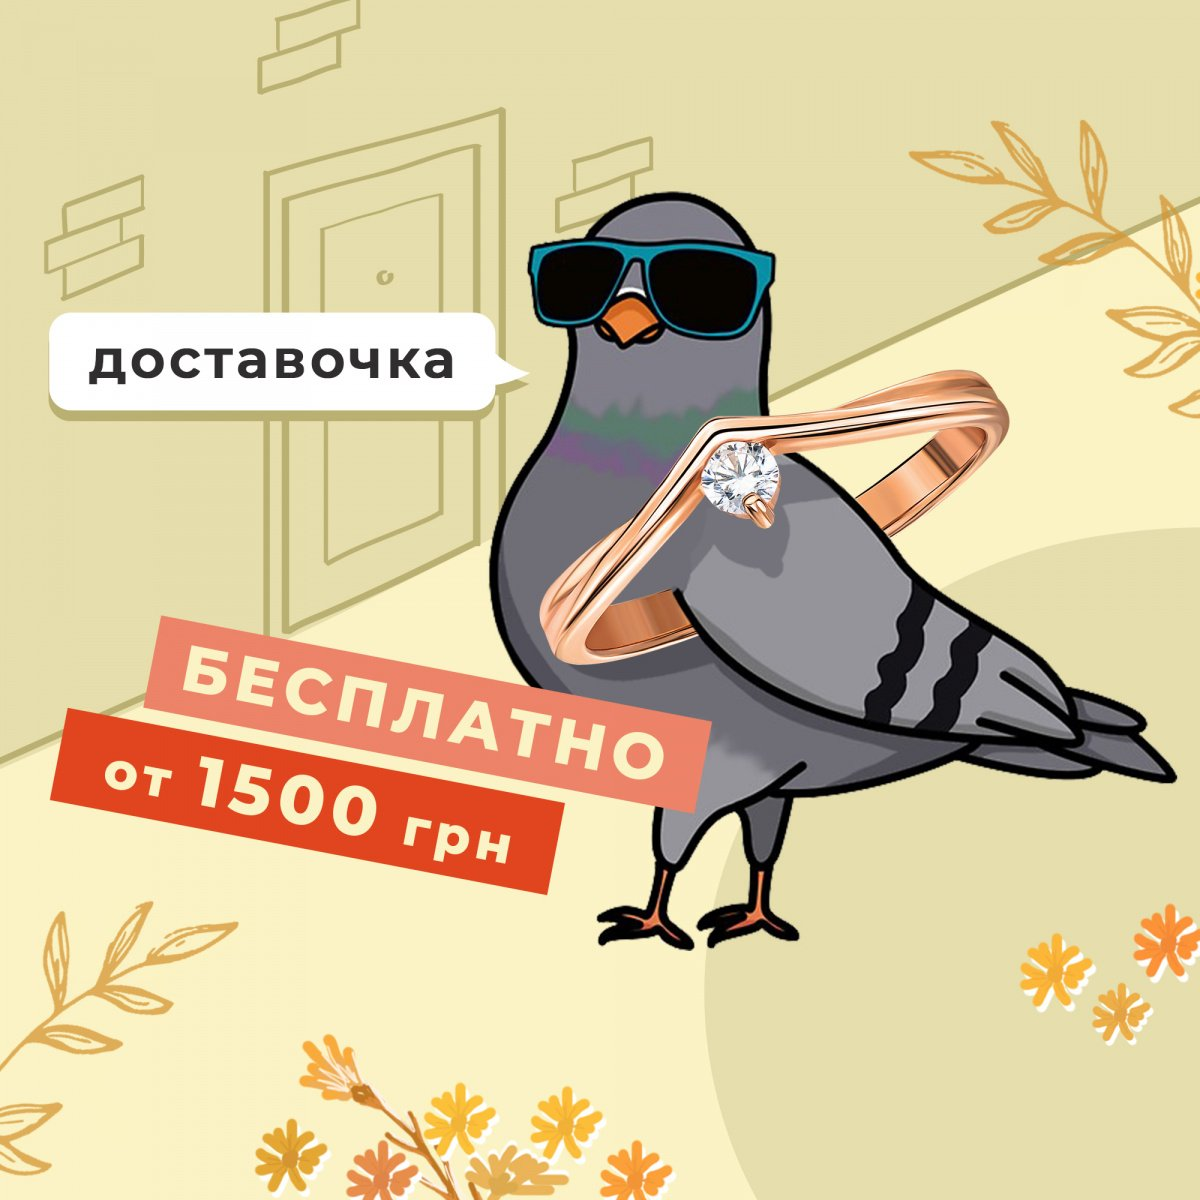 easy_dostavka_zakazov_zlatoua_2000x2000_ru.jpg